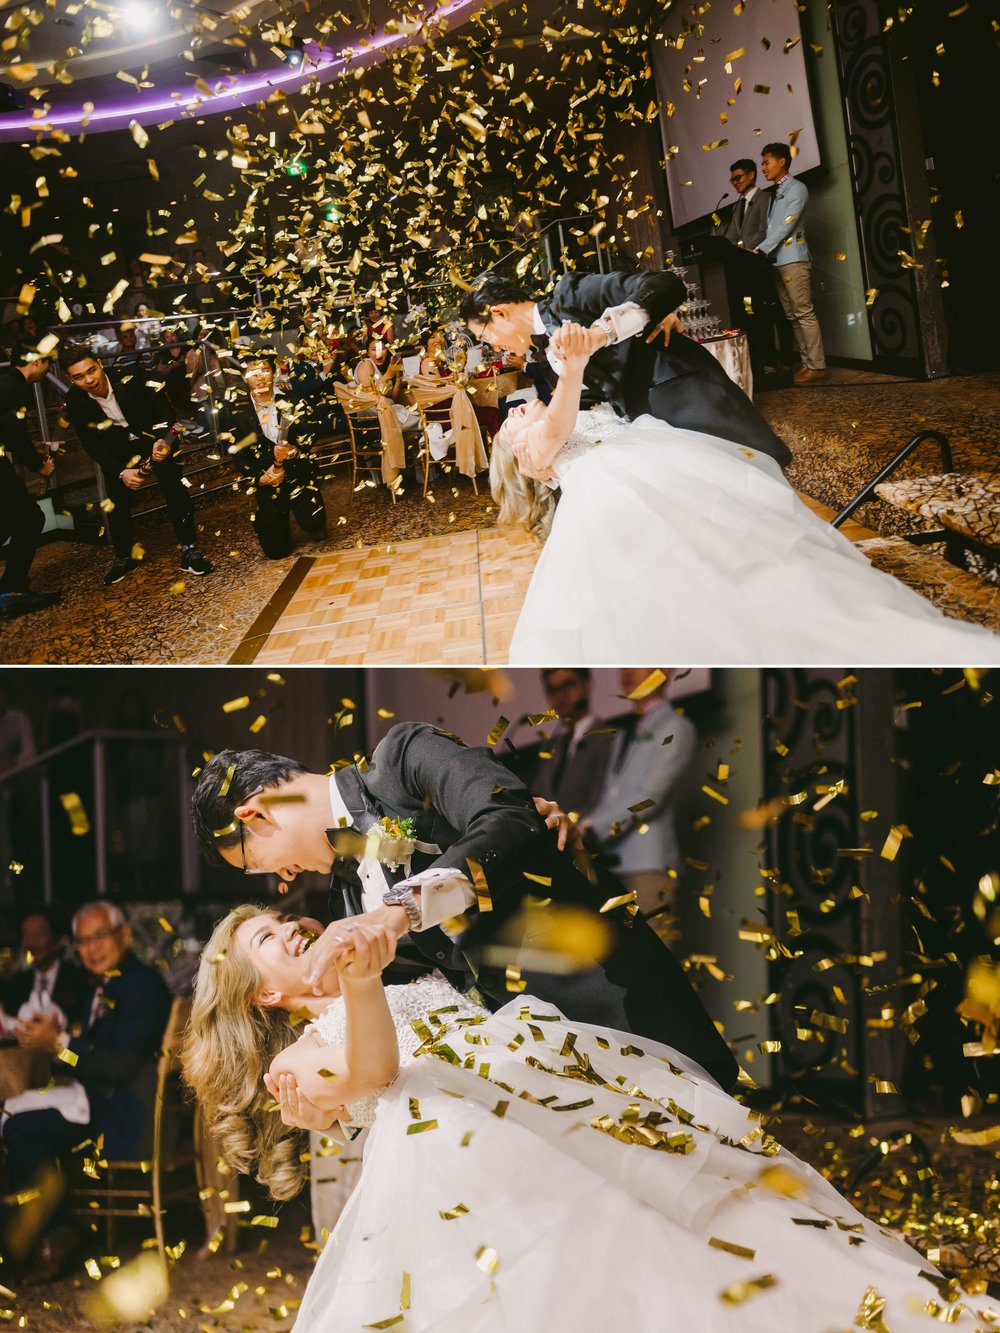 wedding_photographer_singapore 37.jpg